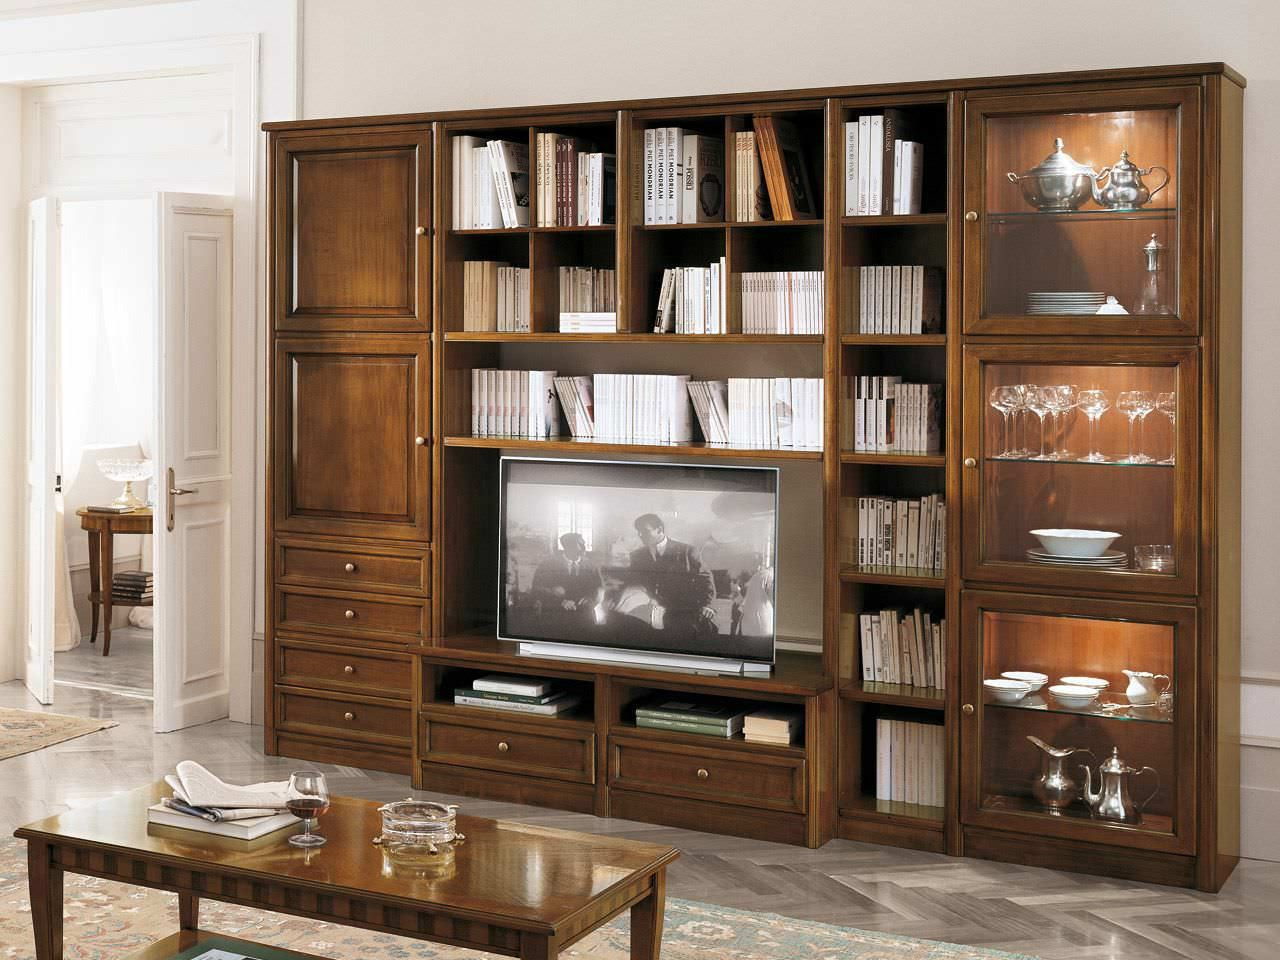 Muebles para living comedor buscar con google muebles for Muebles modulares living